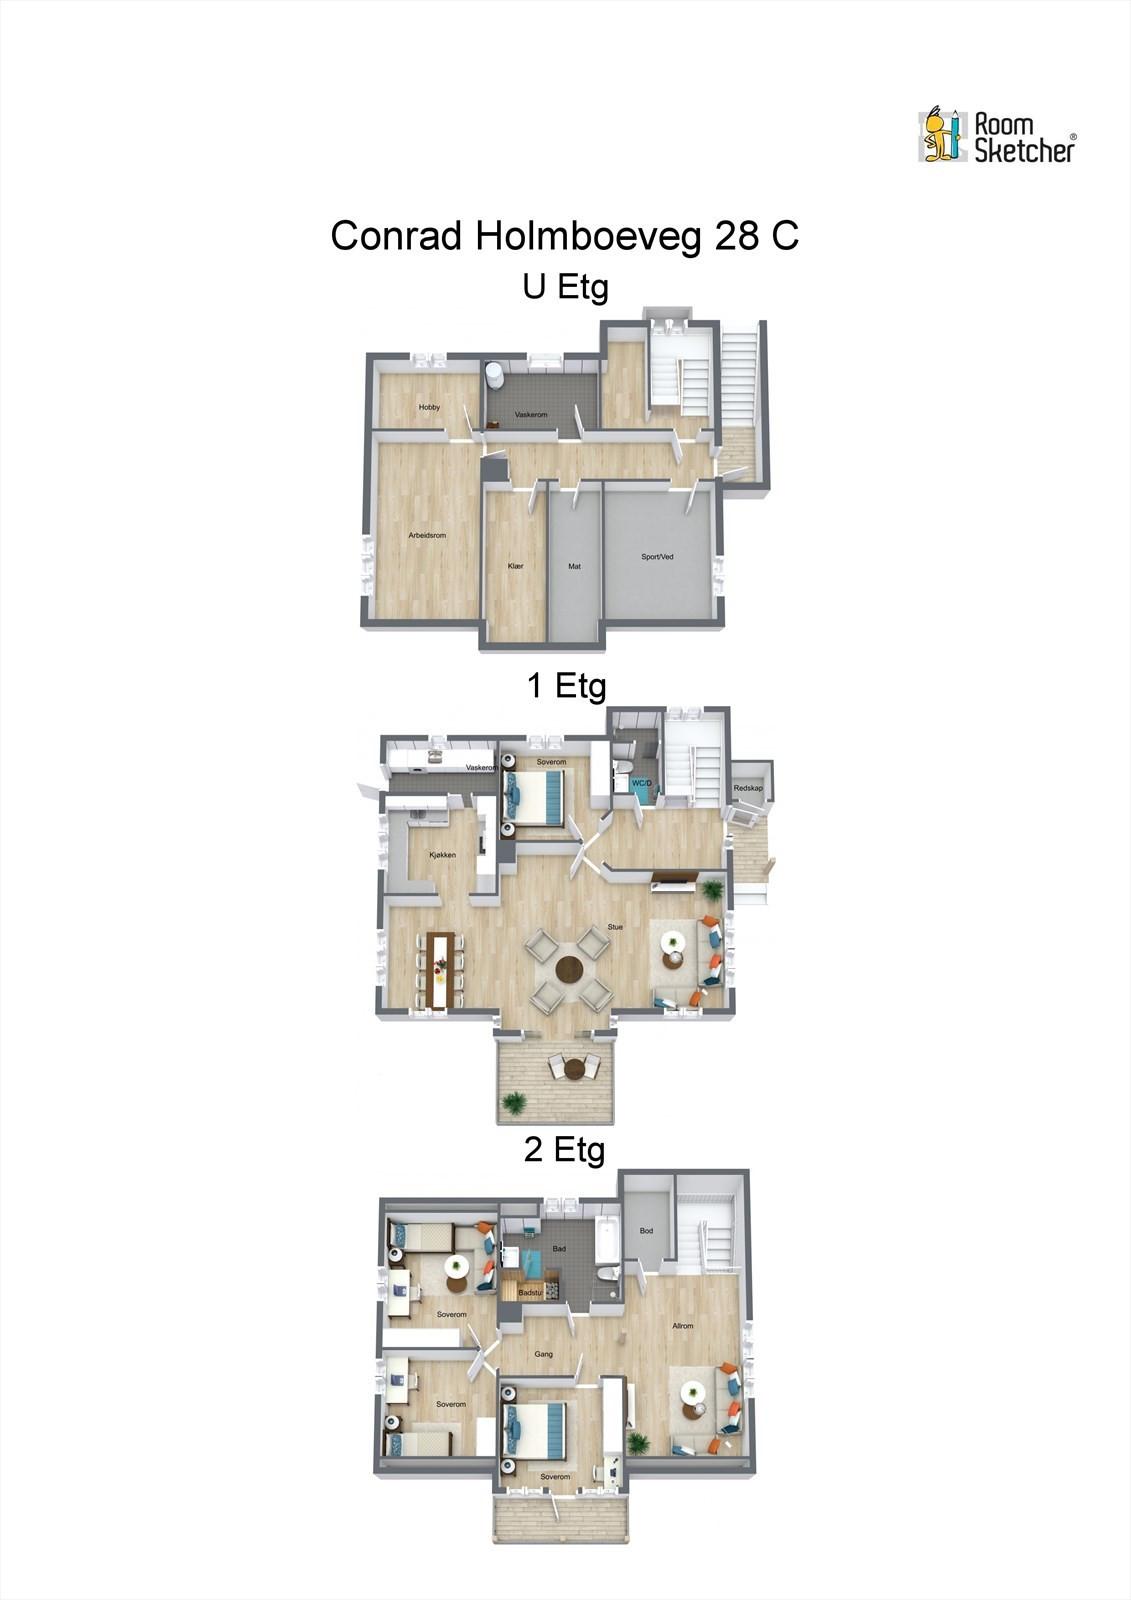 Project letterhead - Conrad Holmboeveg 28 C - 3D Floor Plan.jpg